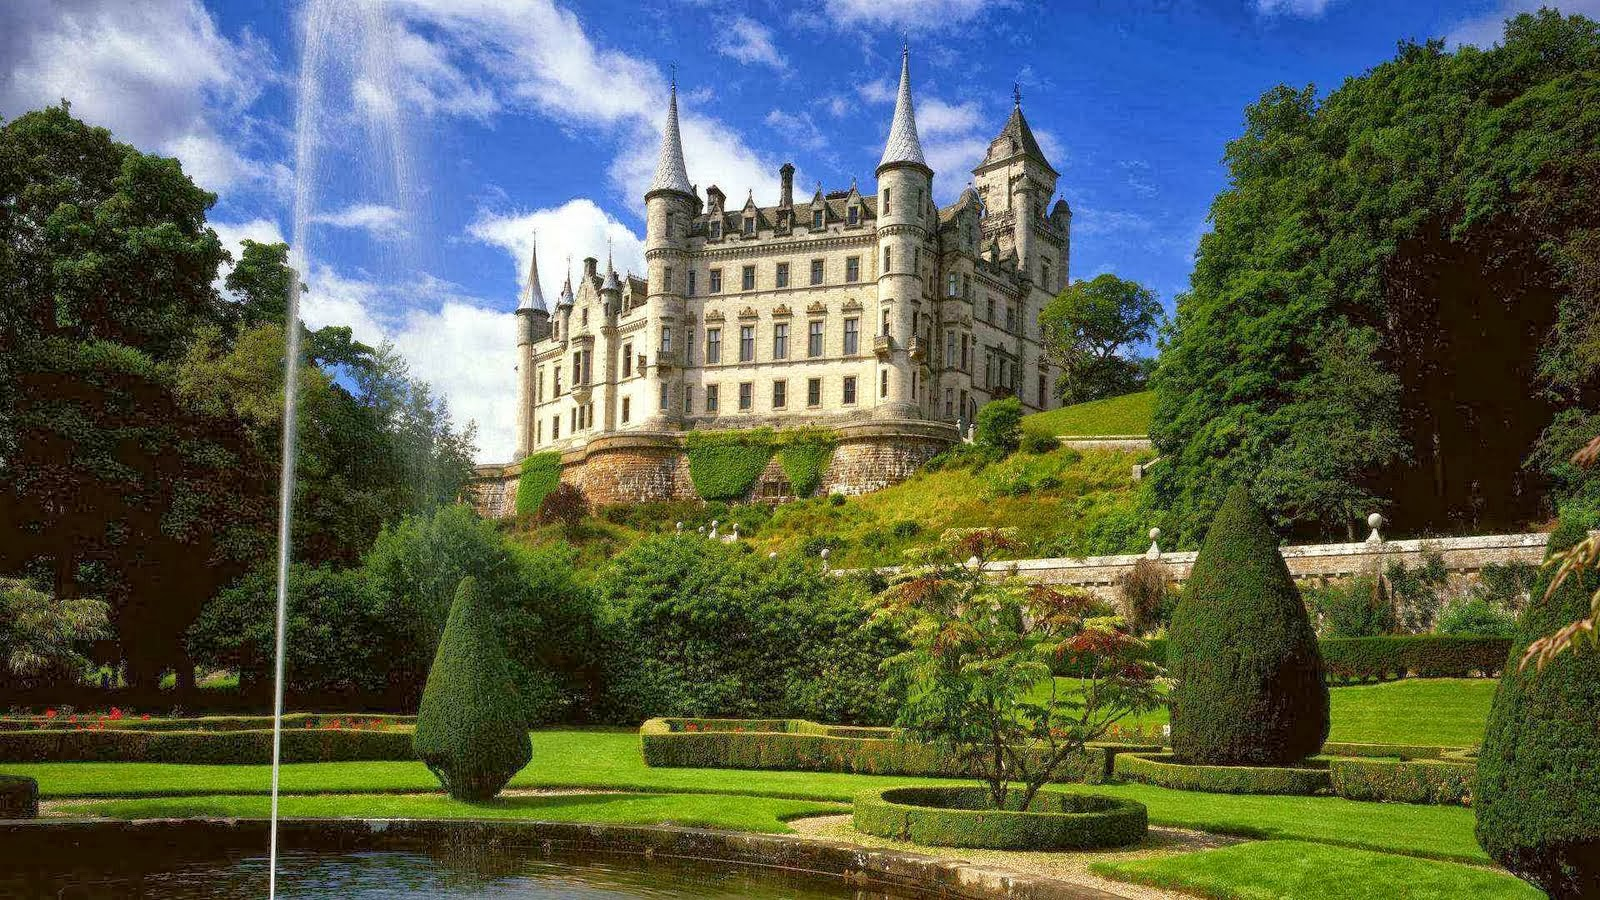 Hd Castle Wallpaper Wallpapersafari